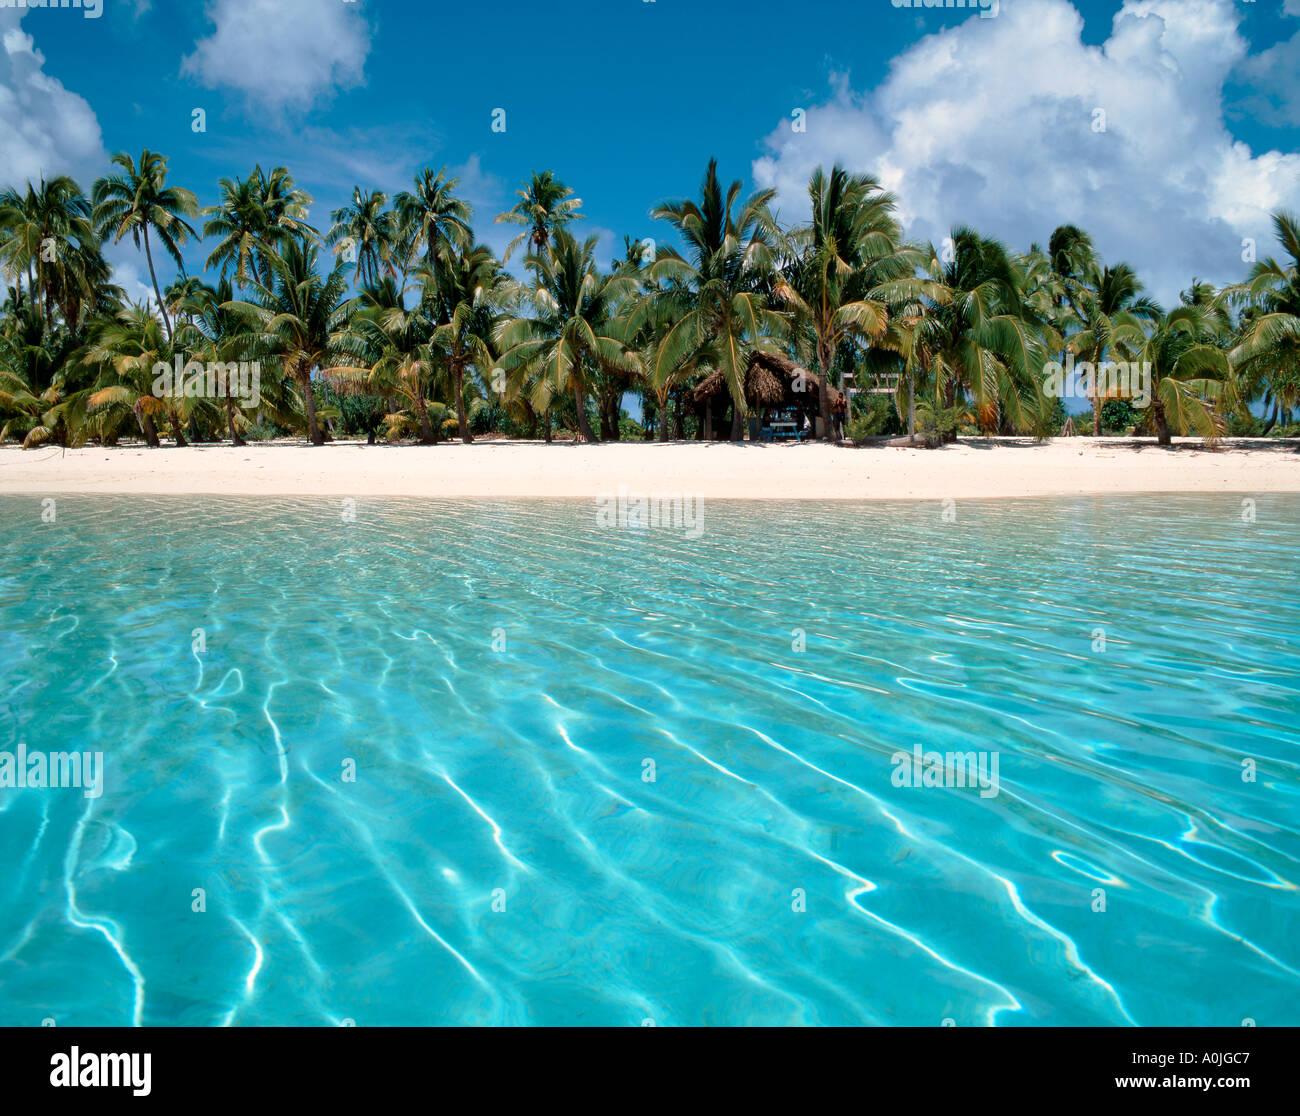 South Pacific Beaches: South Pacific Cook Islands Aitutaki Lagoon One Foot Island